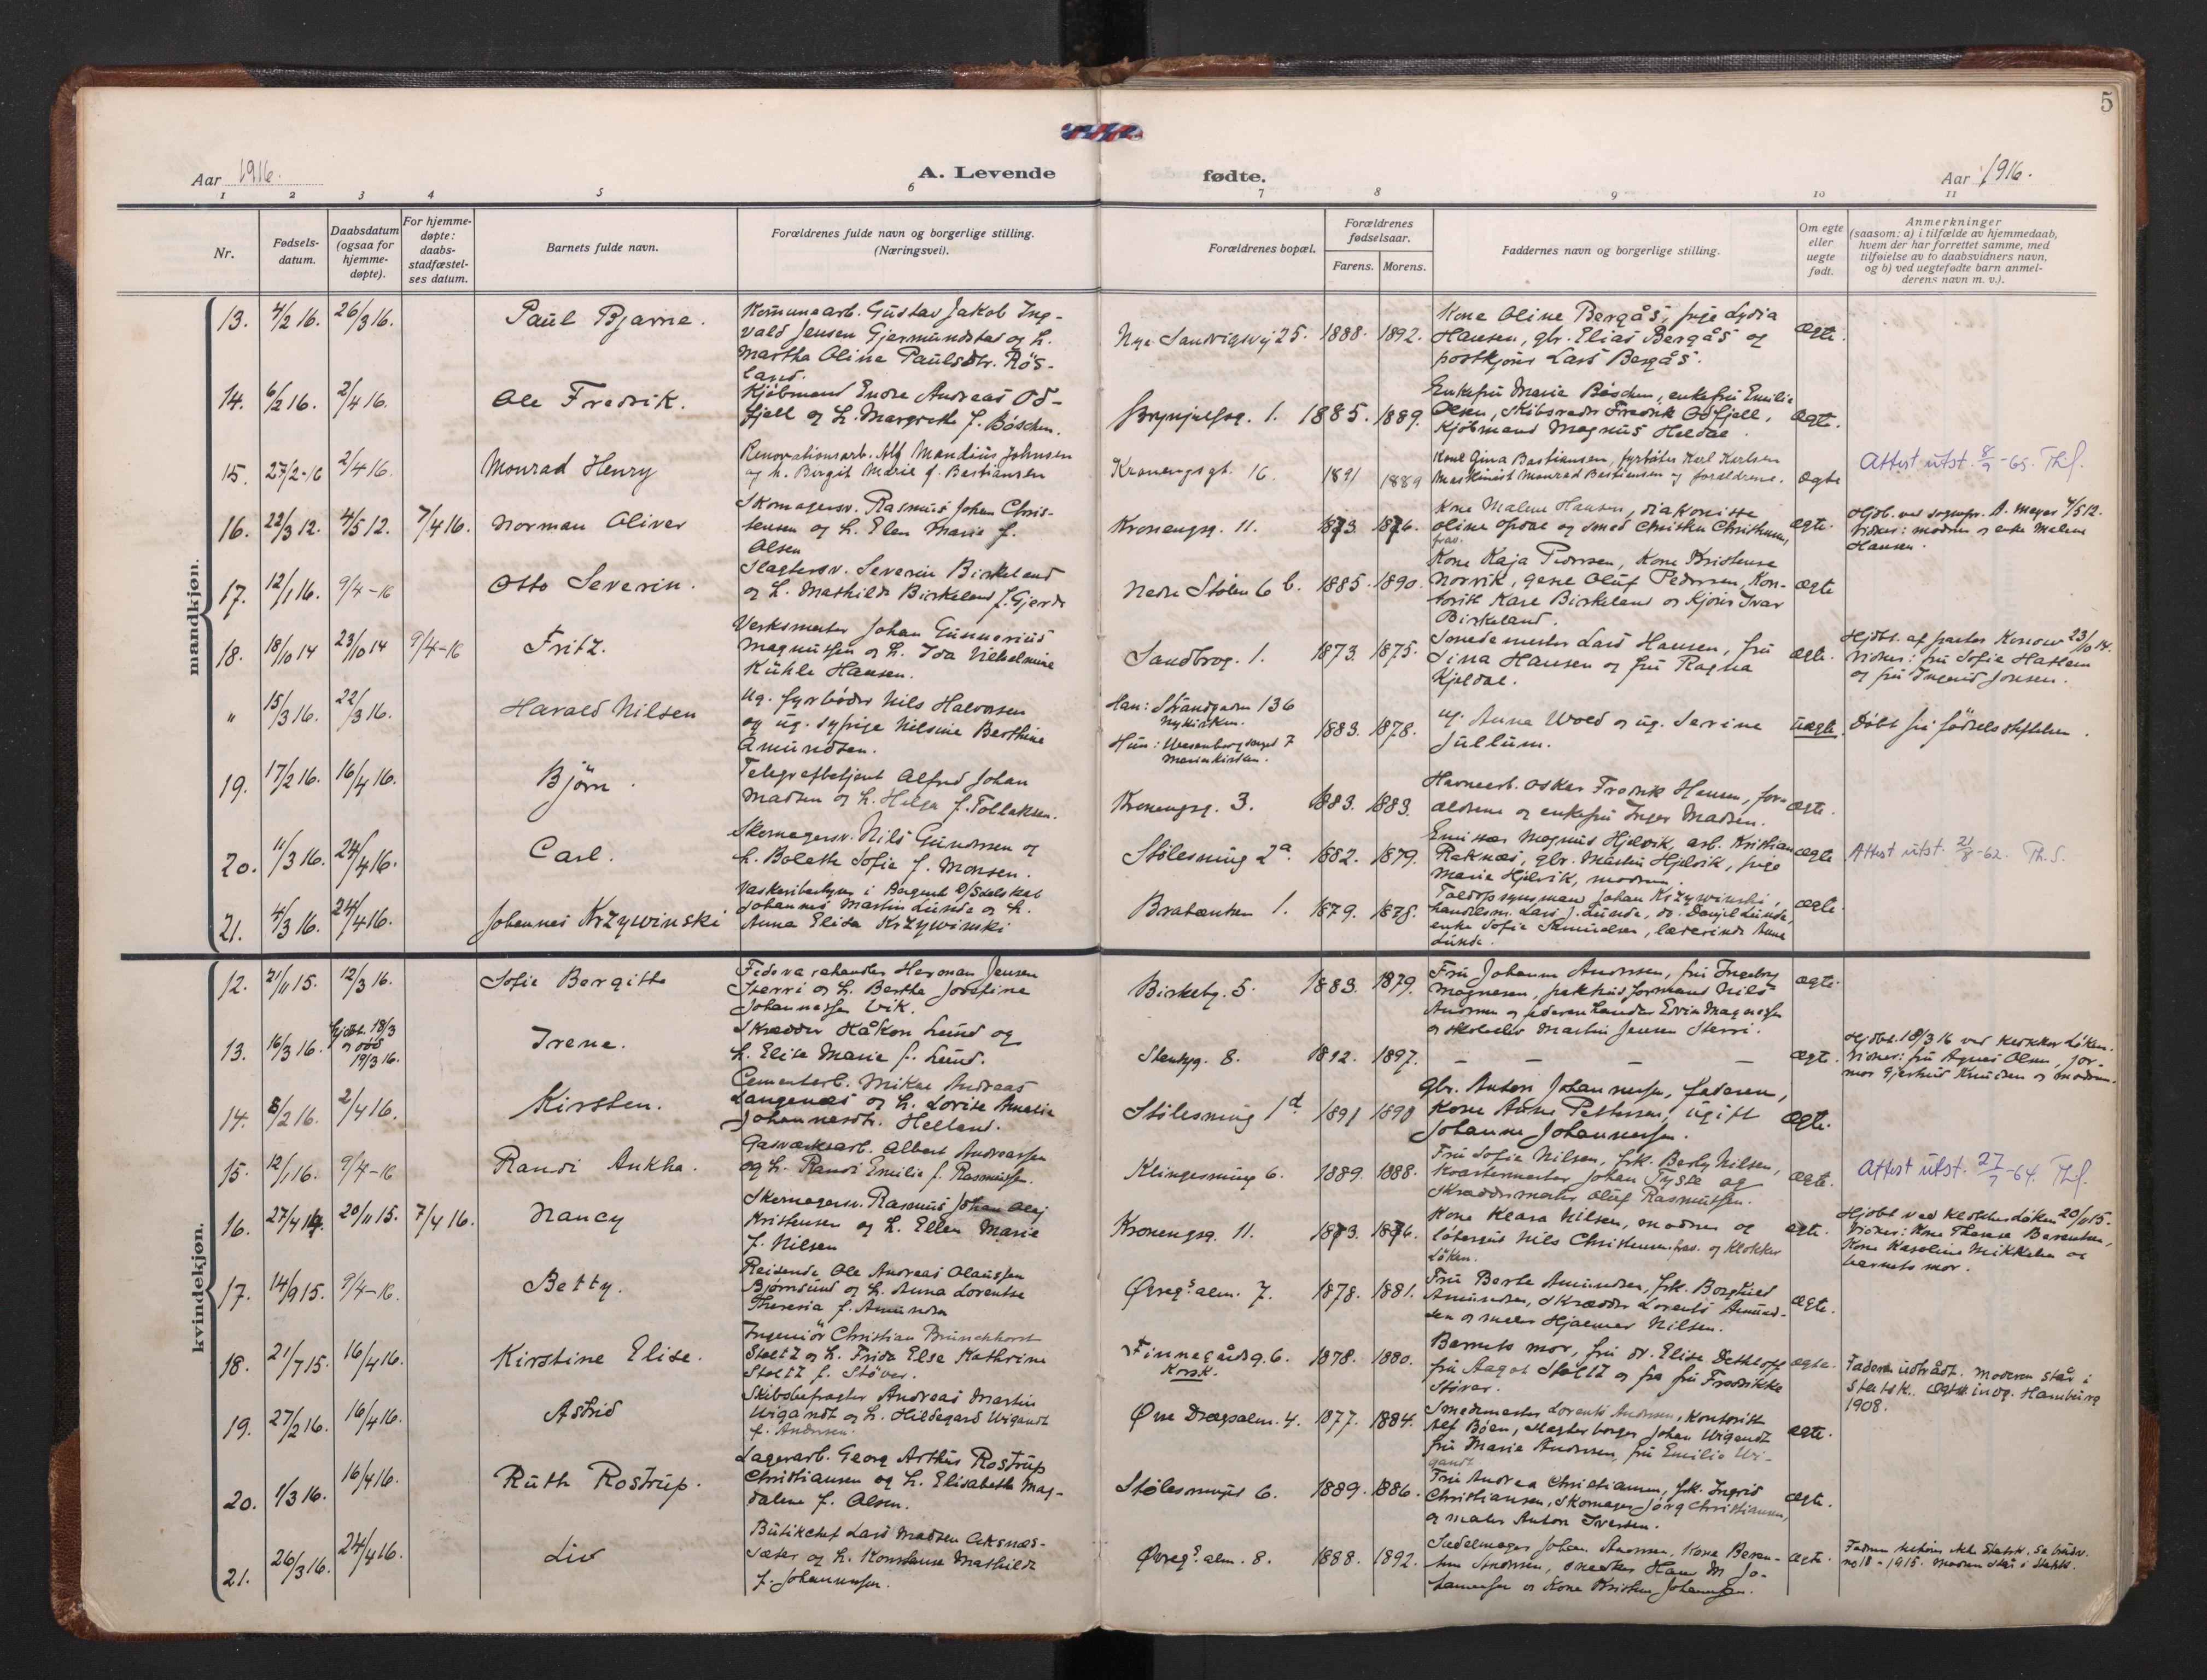 SAB, Mariakirken Sokneprestembete, H/Haa/L0011: Ministerialbok nr. B 2, 1916-1934, s. 4b-5a